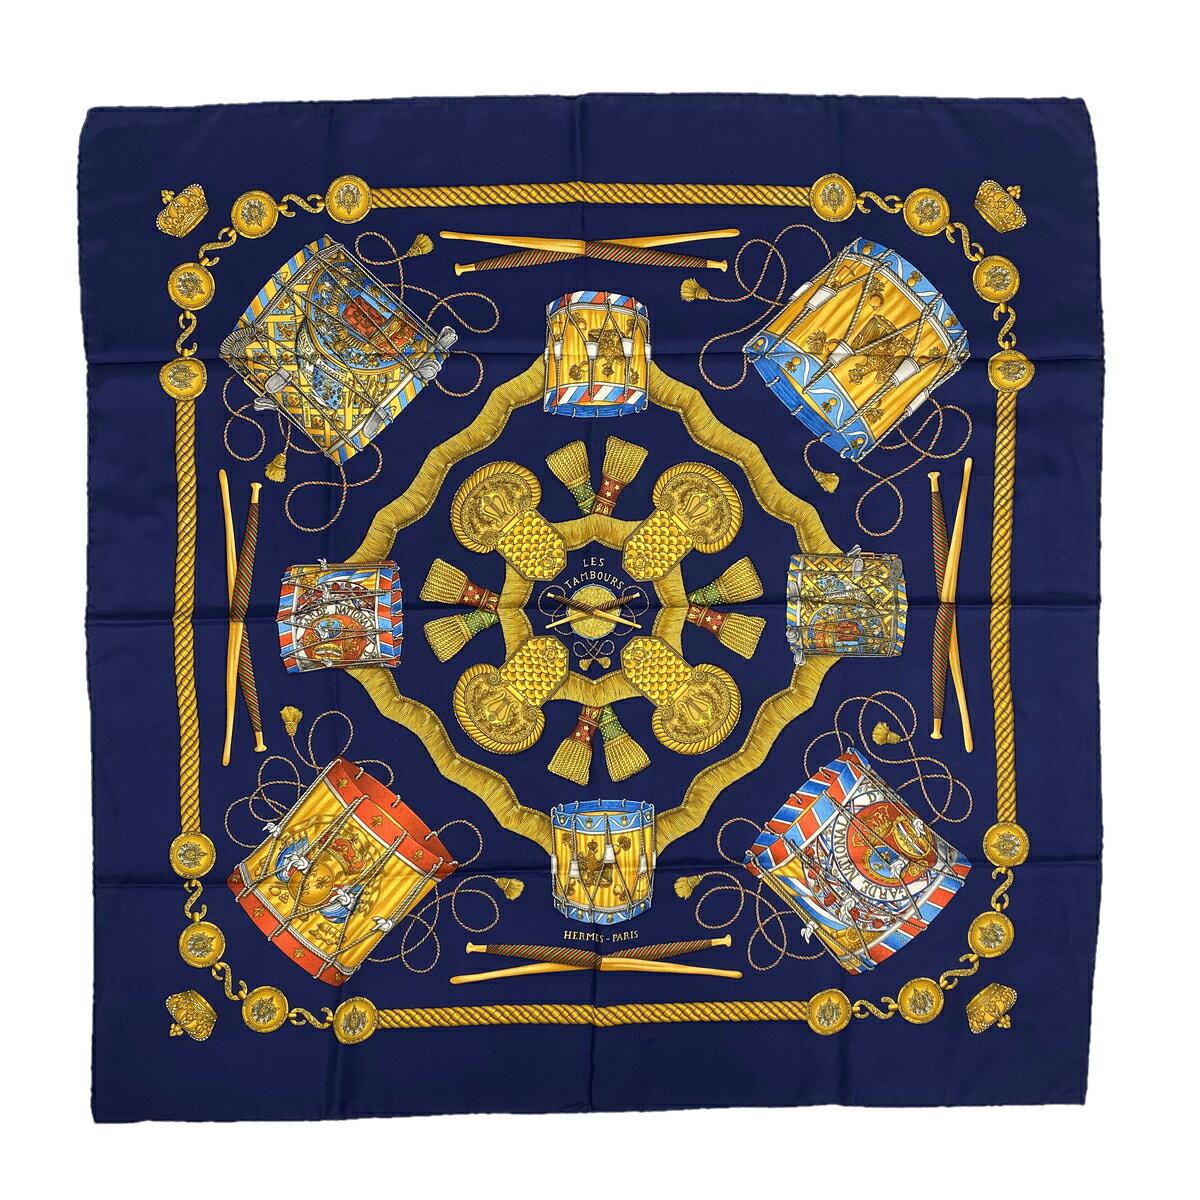 HERMES scarf 90 x 90 HERMES 90 LES TAMBOURS